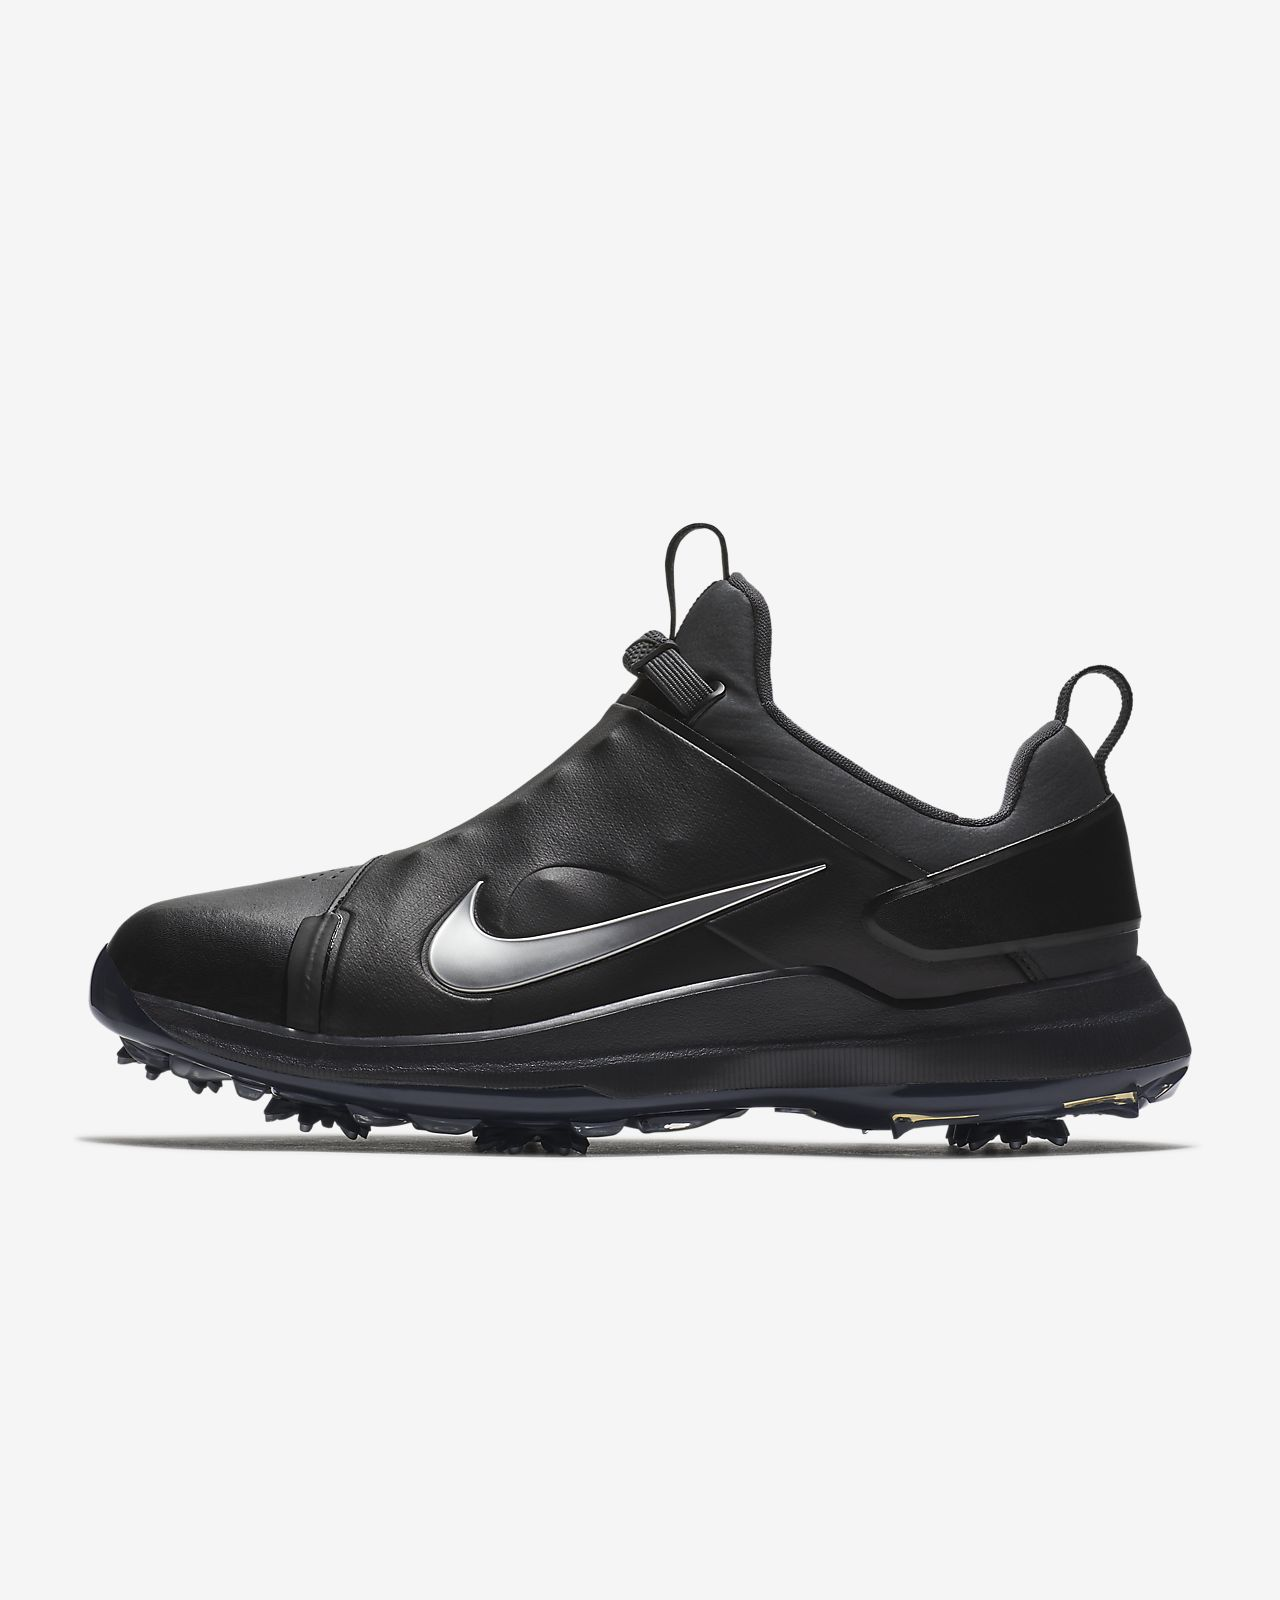 best service 79f37 d6e4a ... Buty męskie do golfa Nike Golf Tour Premiere